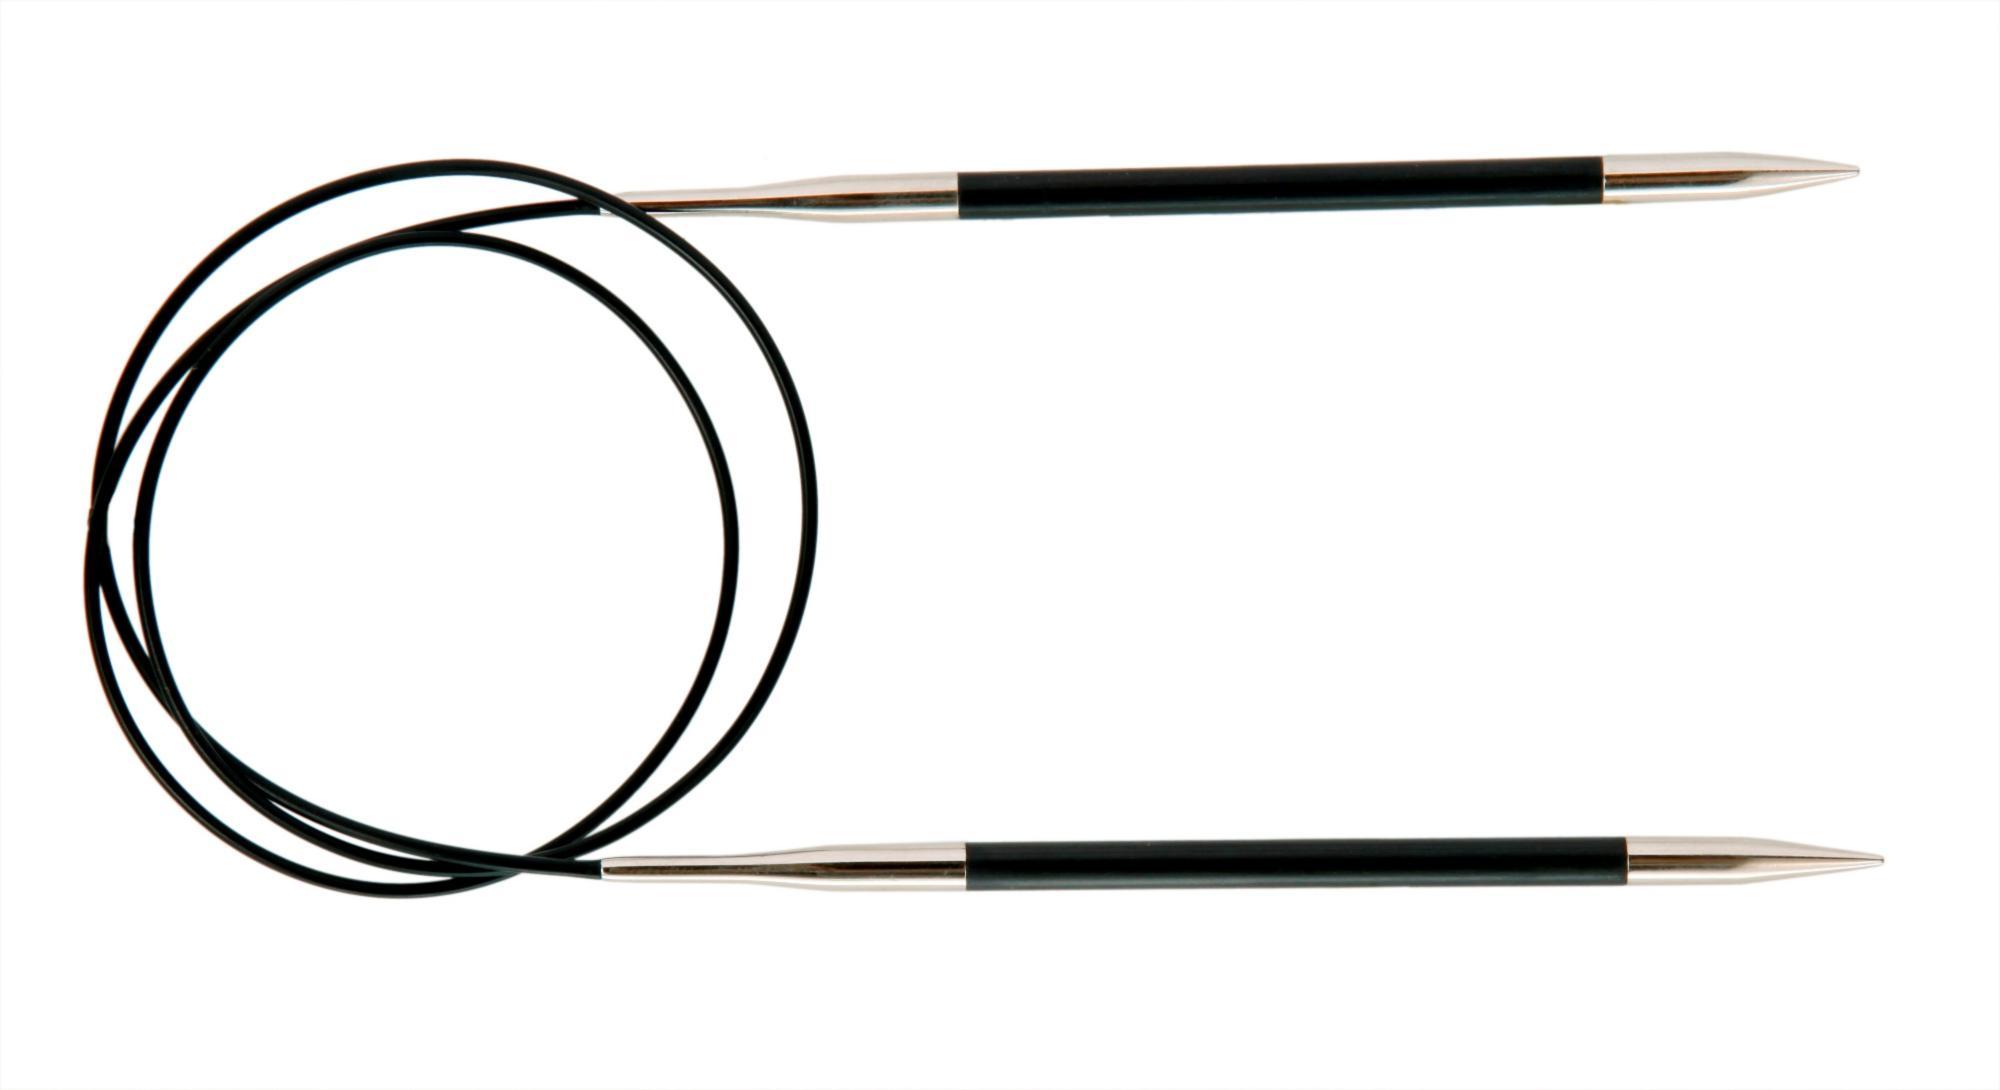 Спицы круговые 80 см Karbonz KnitPro, 41192, 6.00 мм